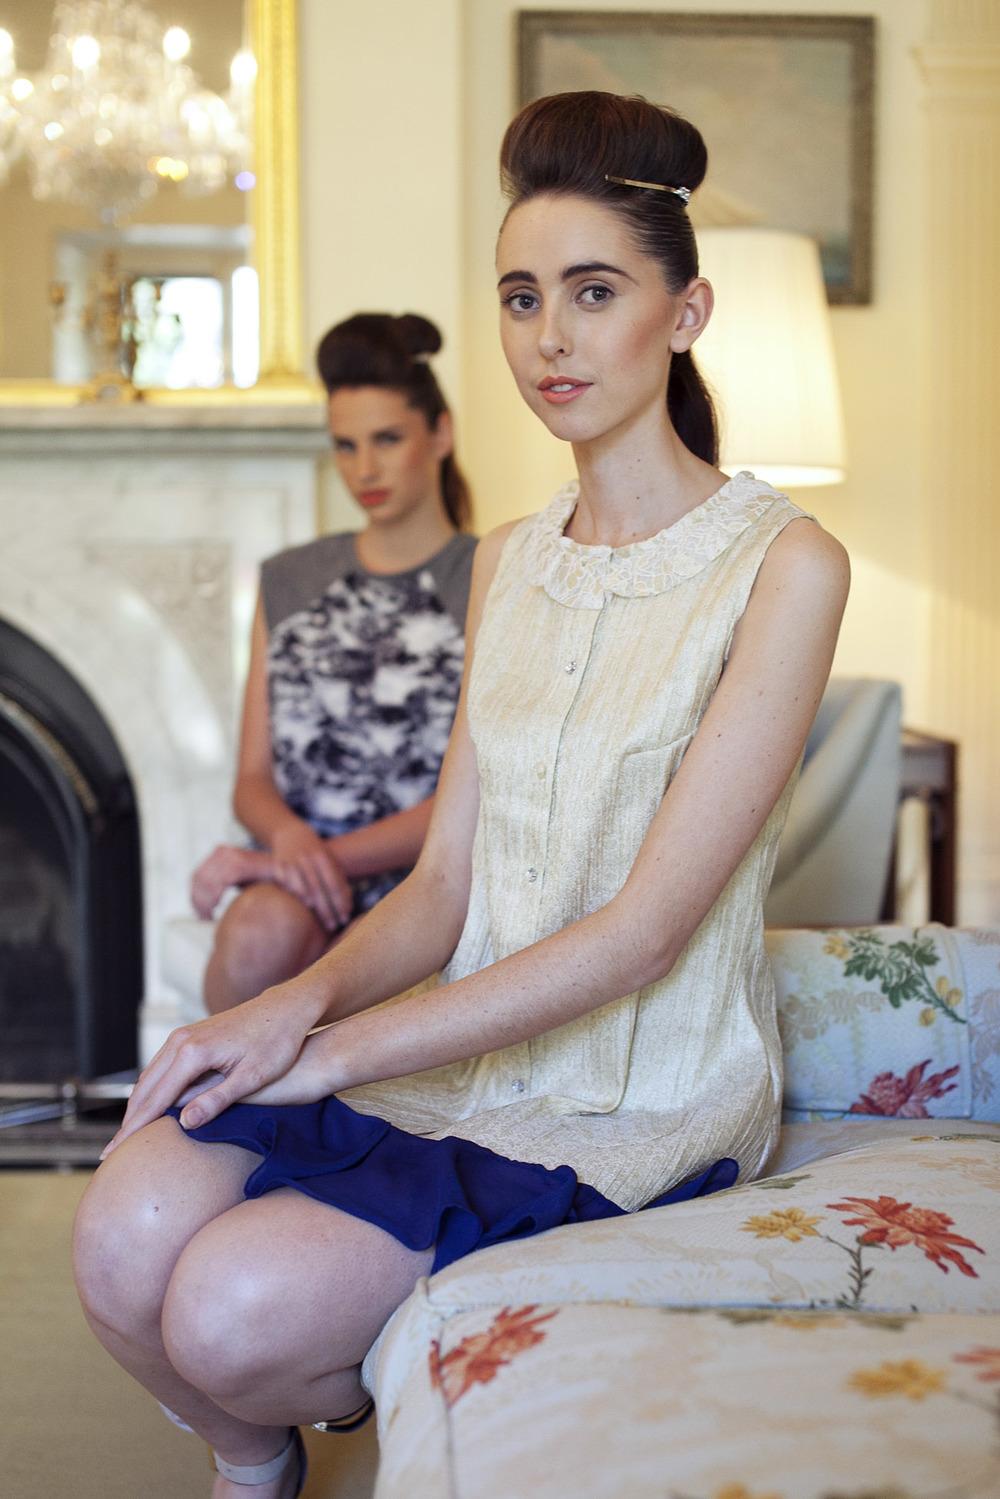 Finesse Models' Alexandra Dawson